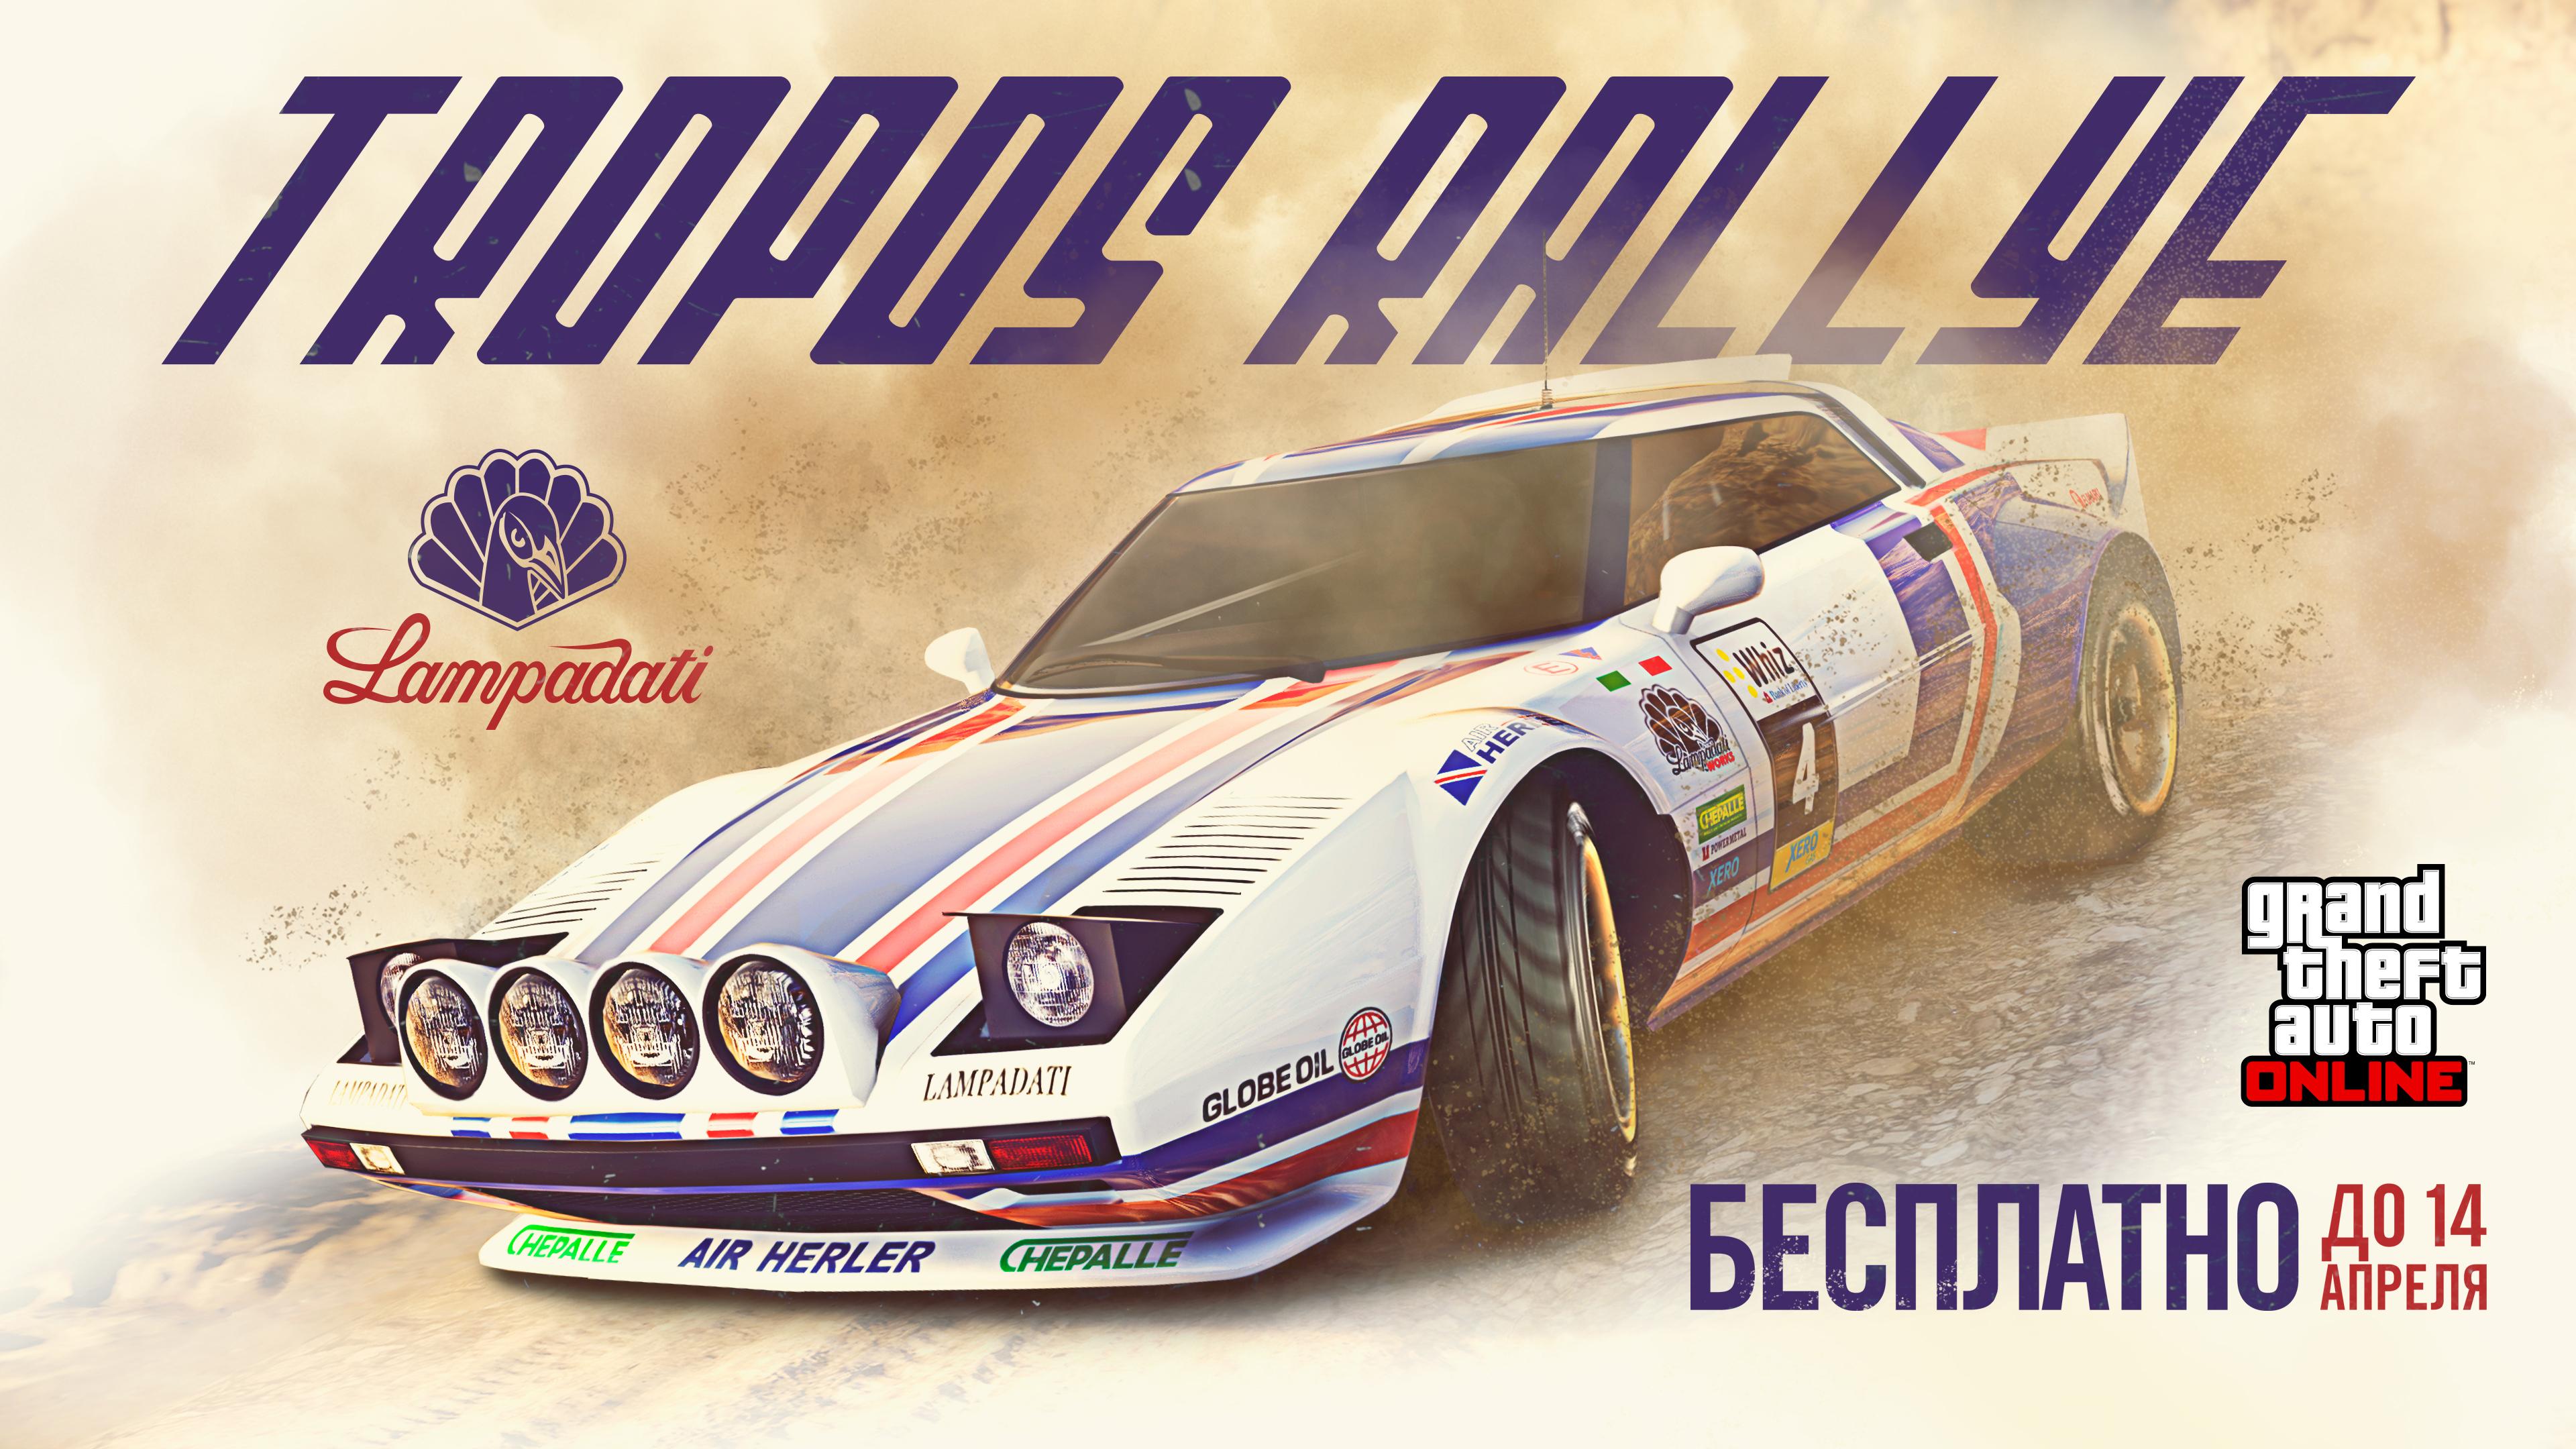 [GTA Online] Бесплатный транспорт: Lampadati Tropos Rallye